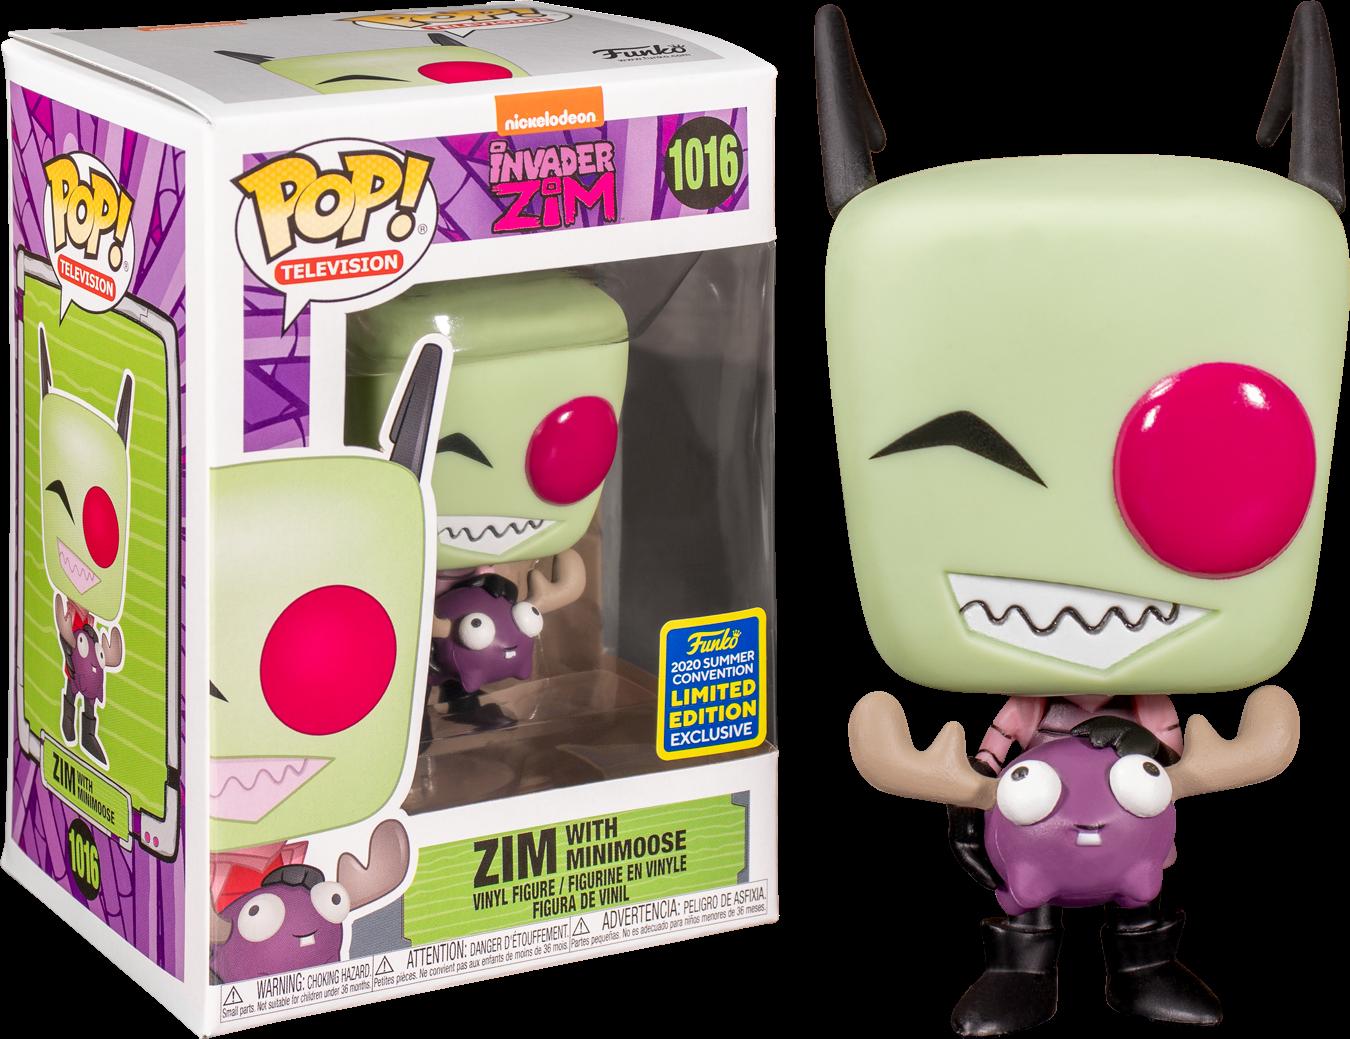 Invader Zim - Zim with Minimoose Pop! Vinyl Figure (2020 Summer Convention Exclusive)